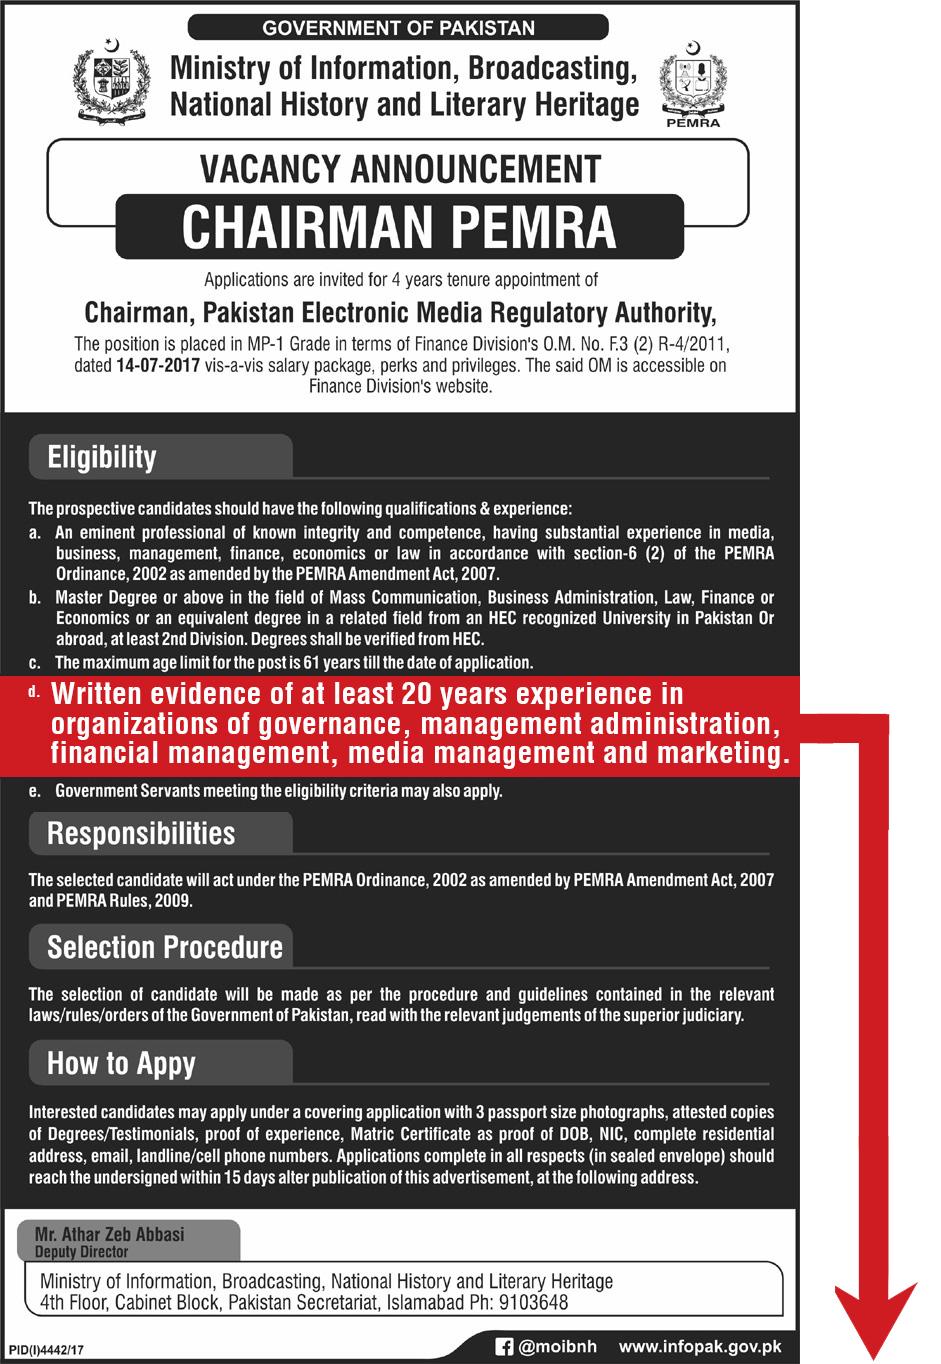 Chairman PEMRA Ad